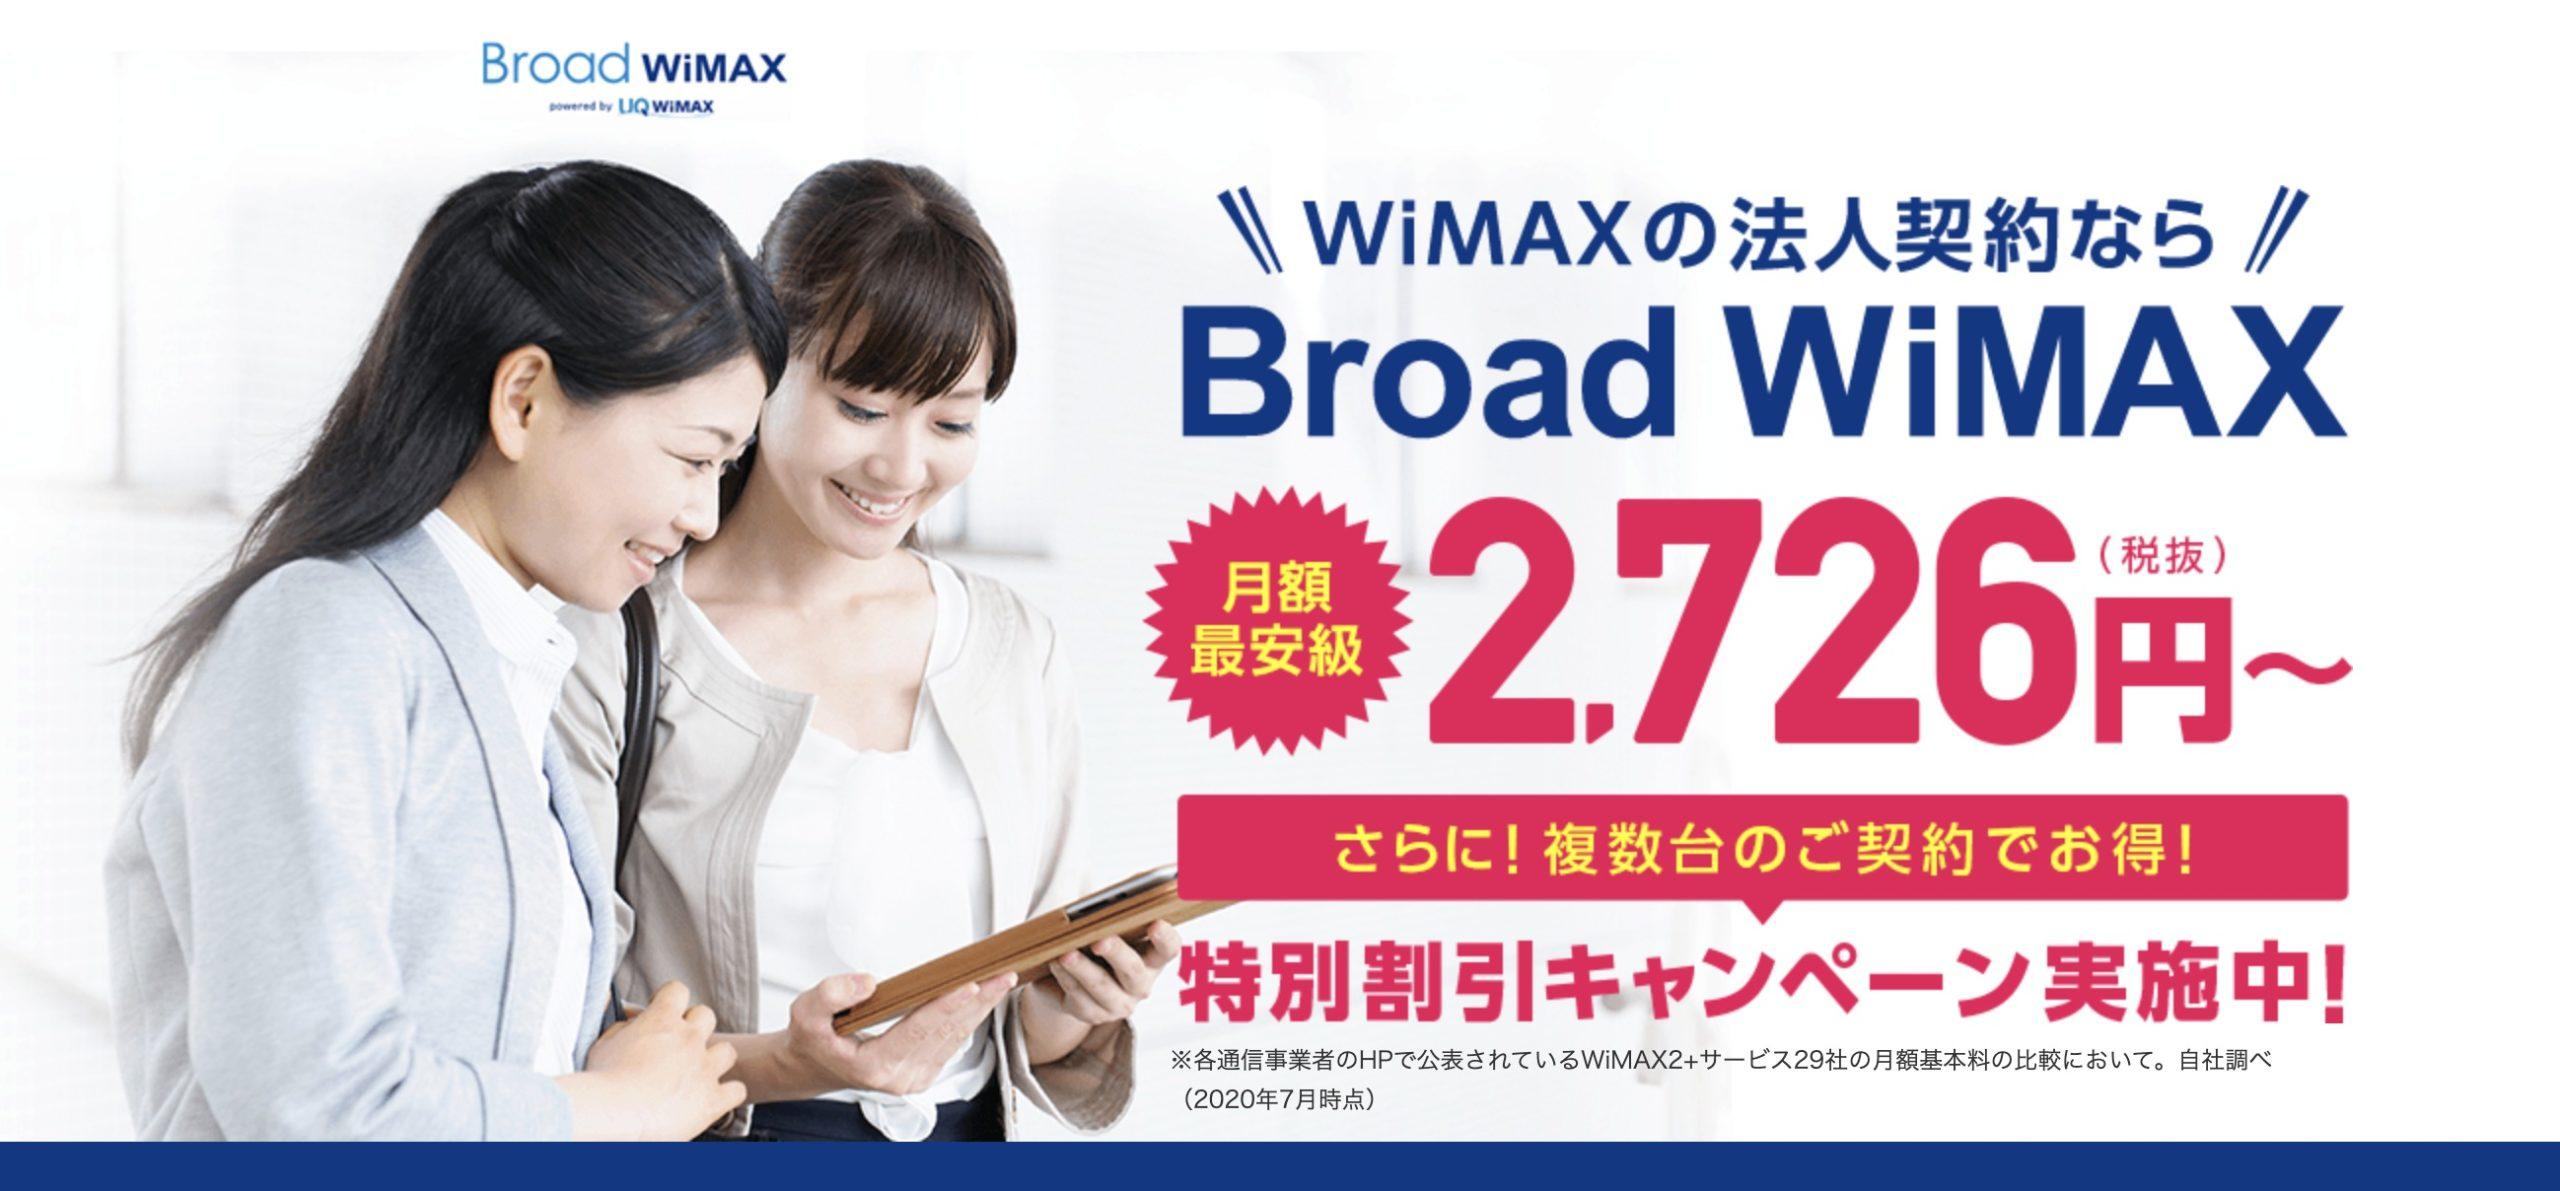 BroadWiMAX公式サイト